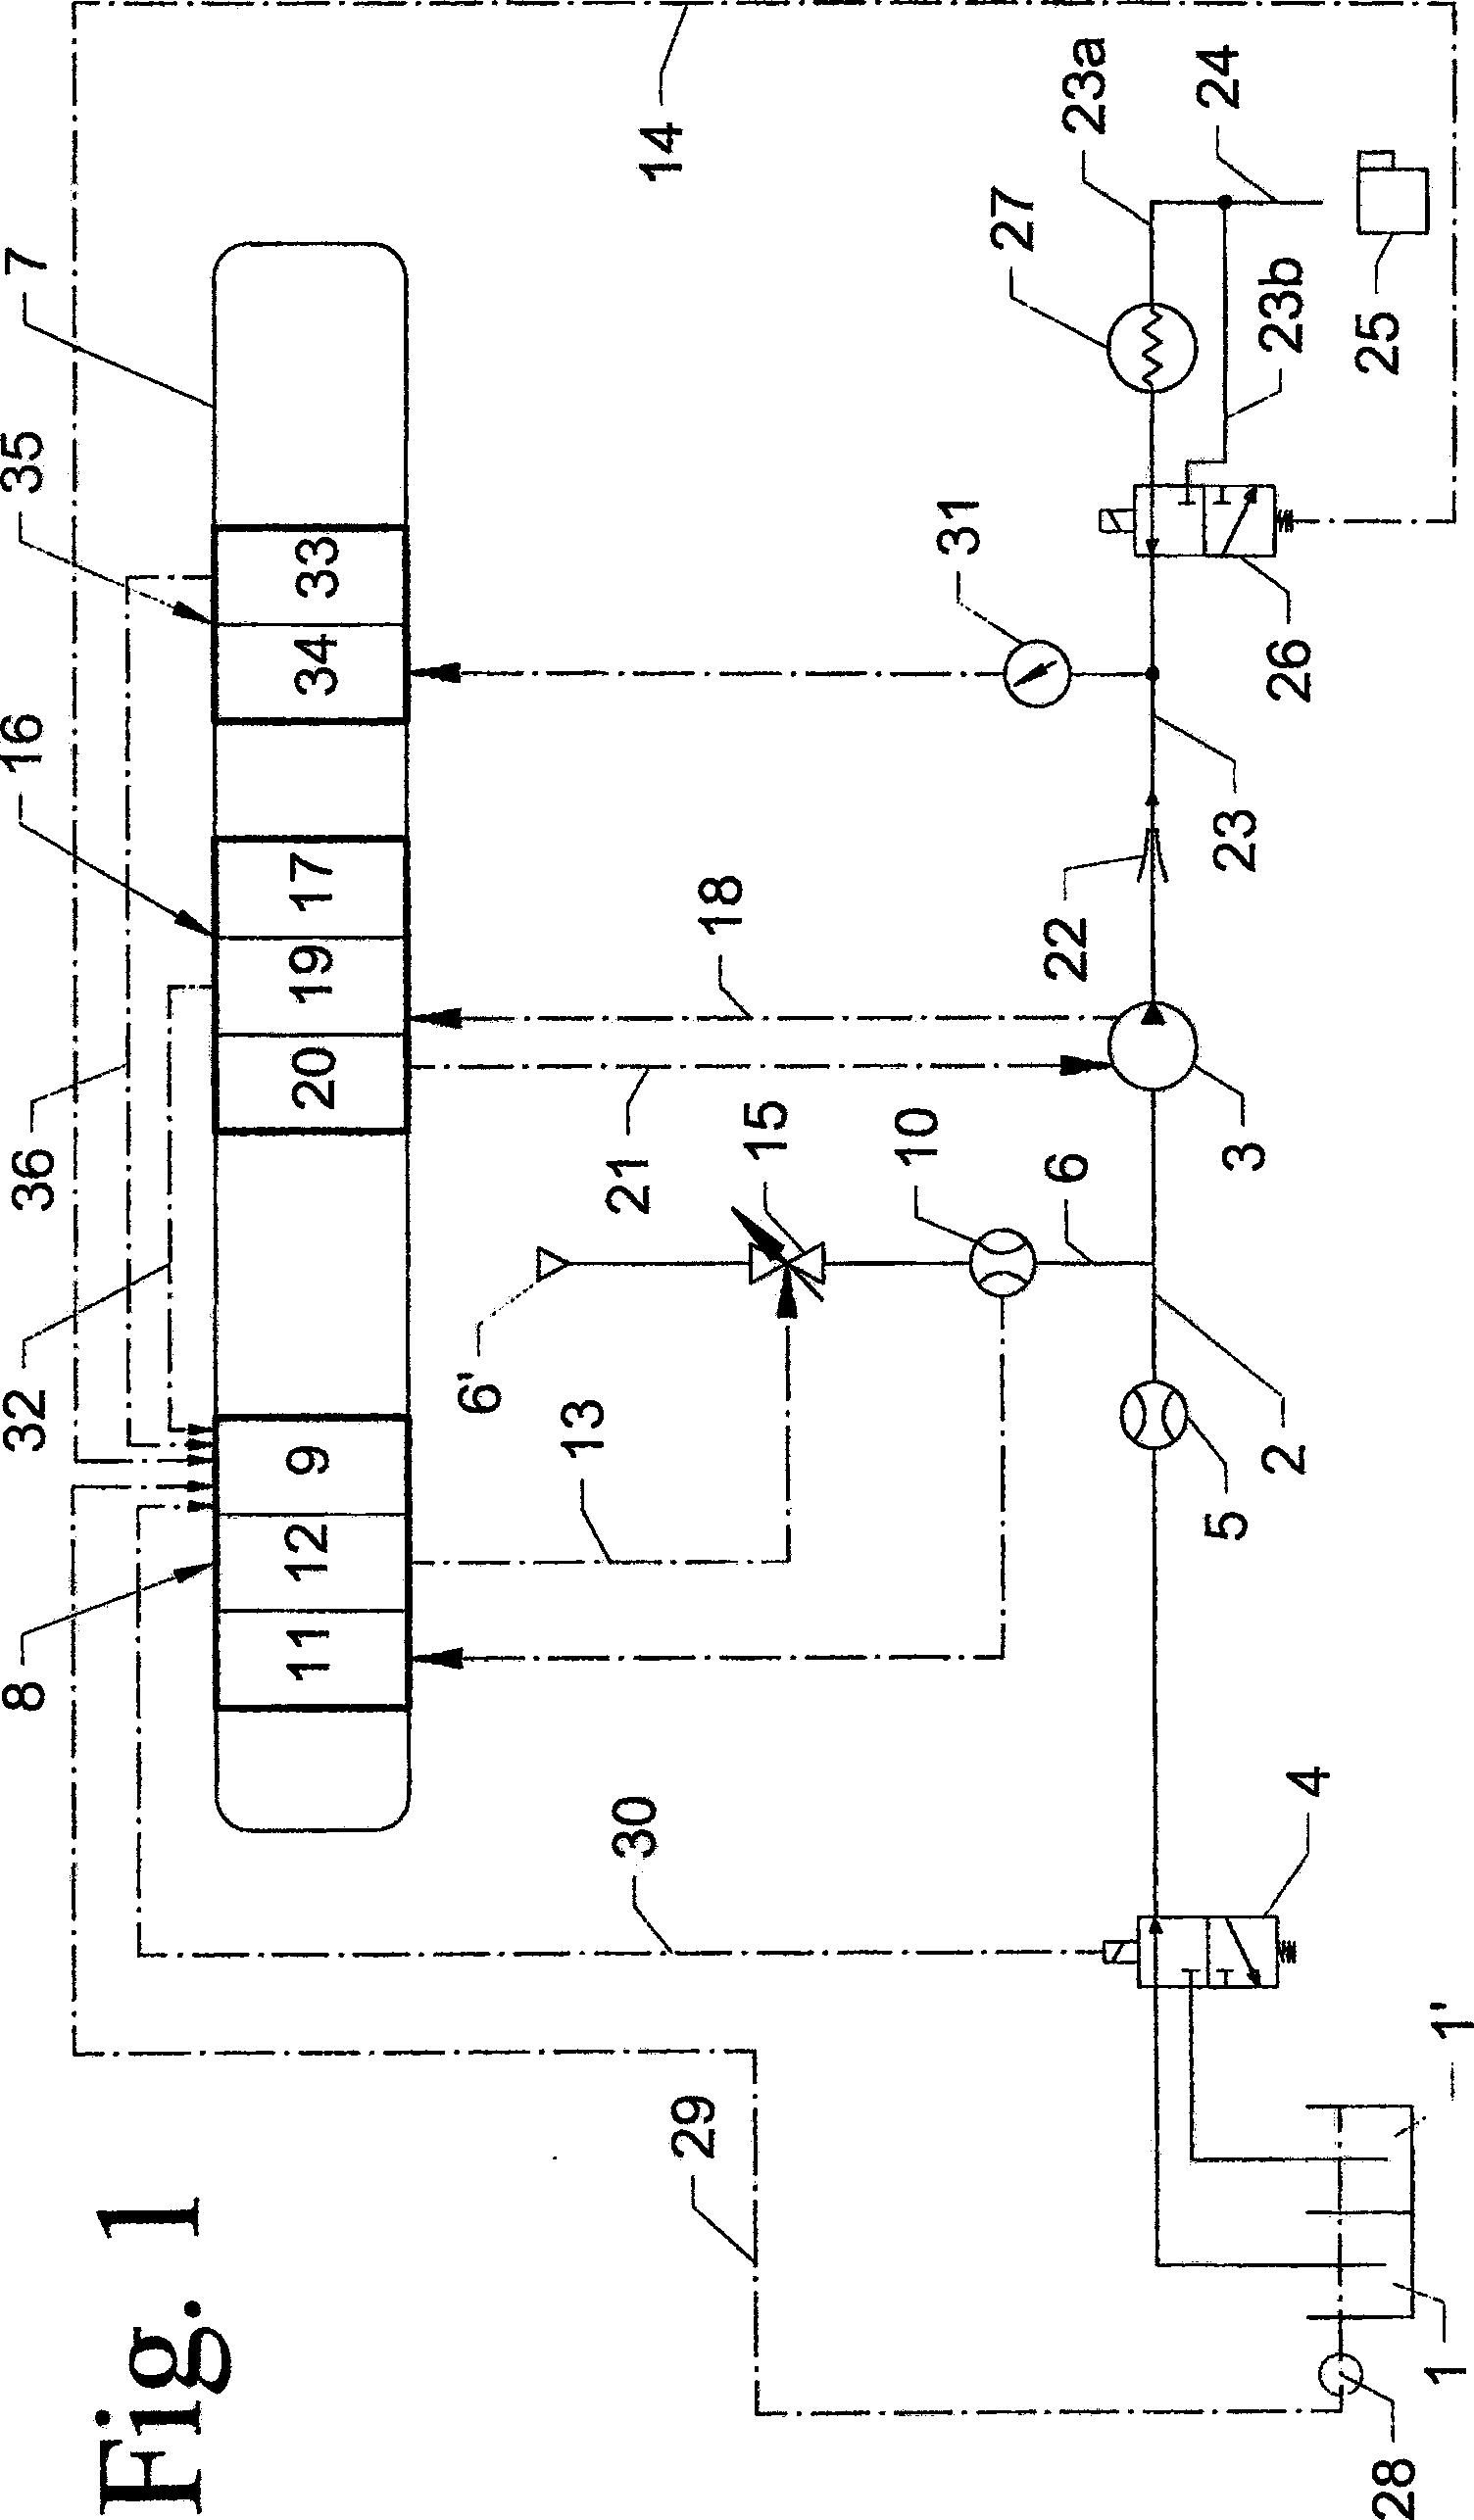 Figure CH711865B1_C0001